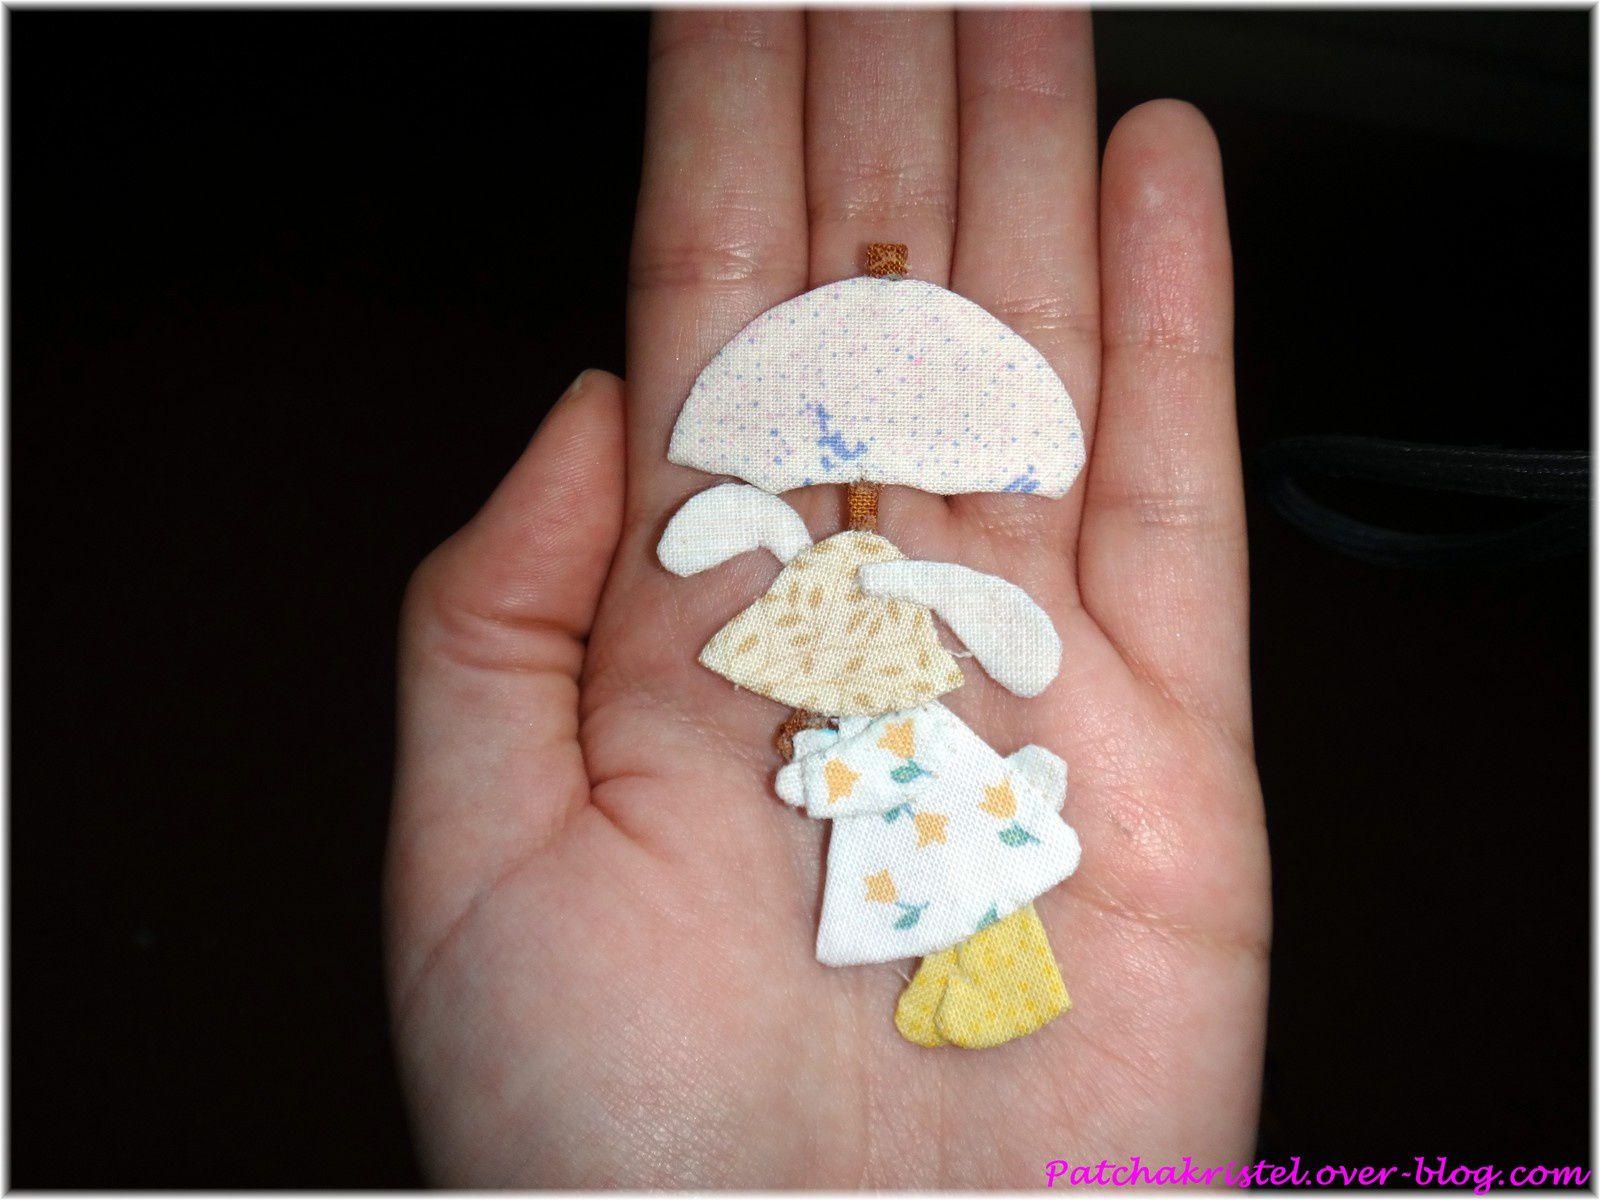 lapin printemps reiko kato - miniature dans ma main